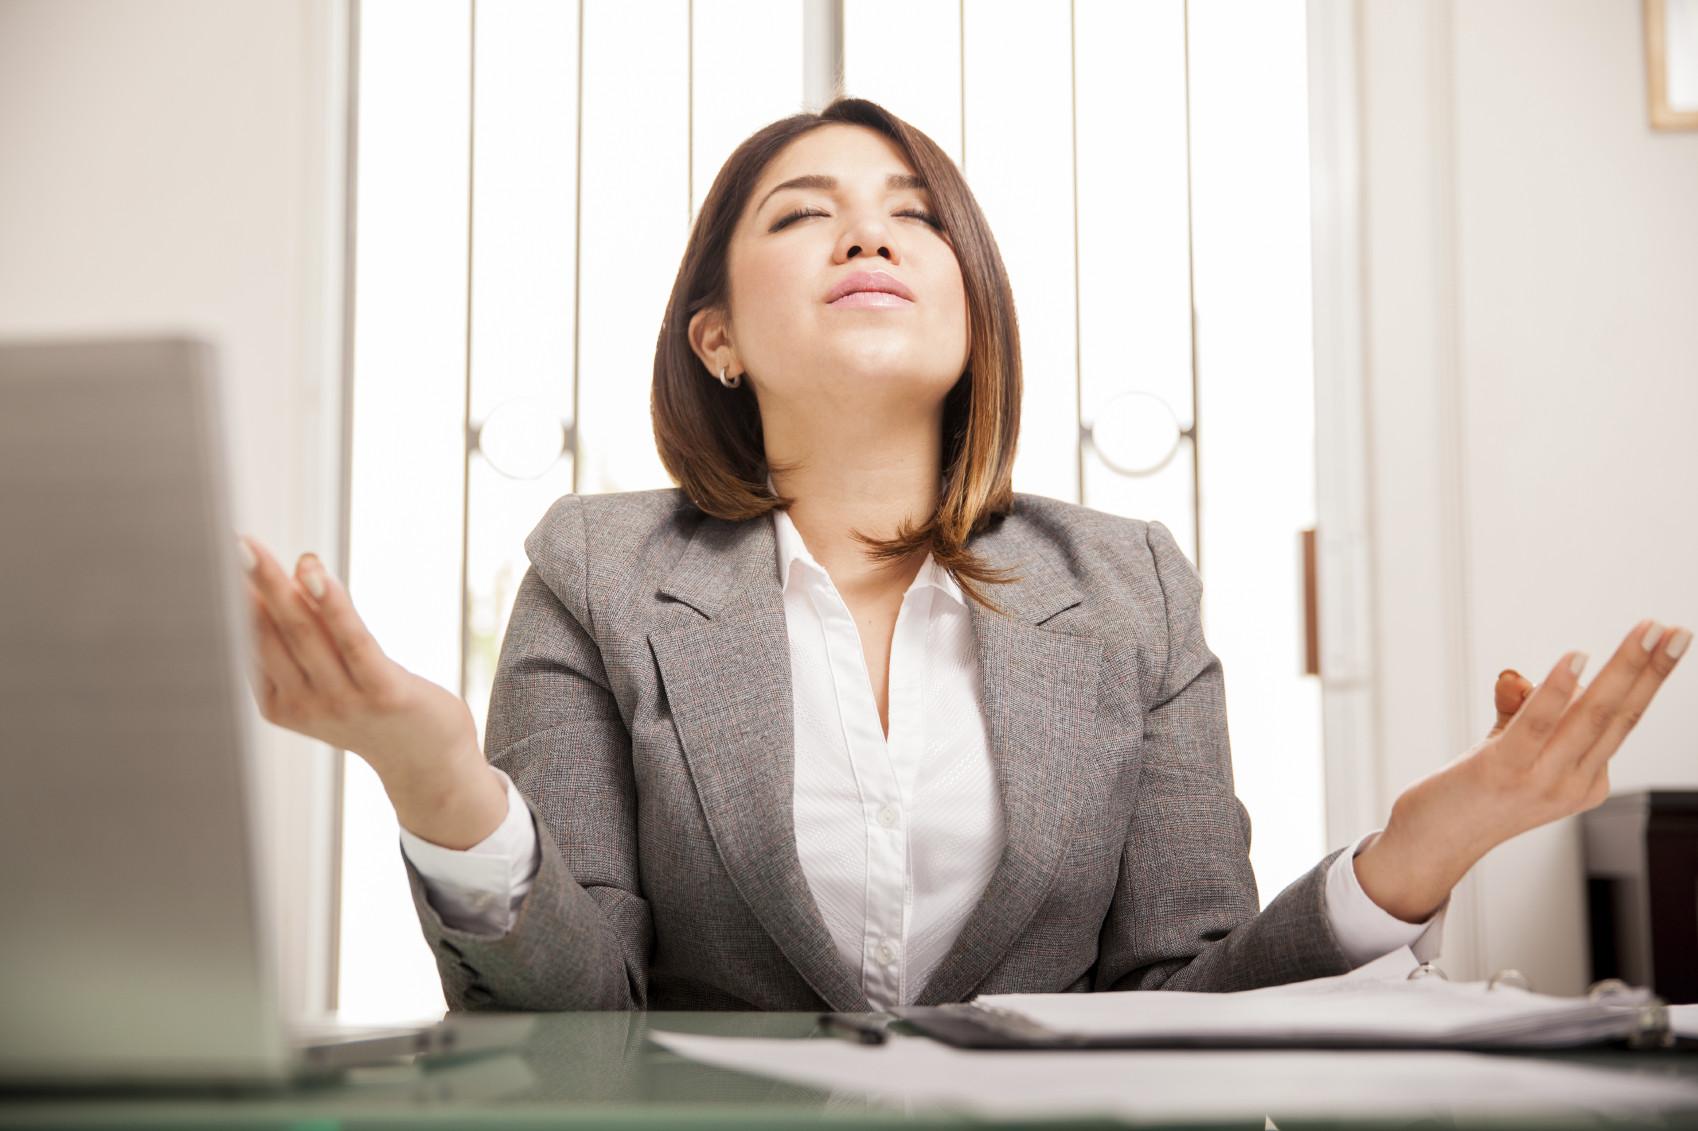 woman-meditating-at-work-mindful-moddiStock_000057640526_Medium